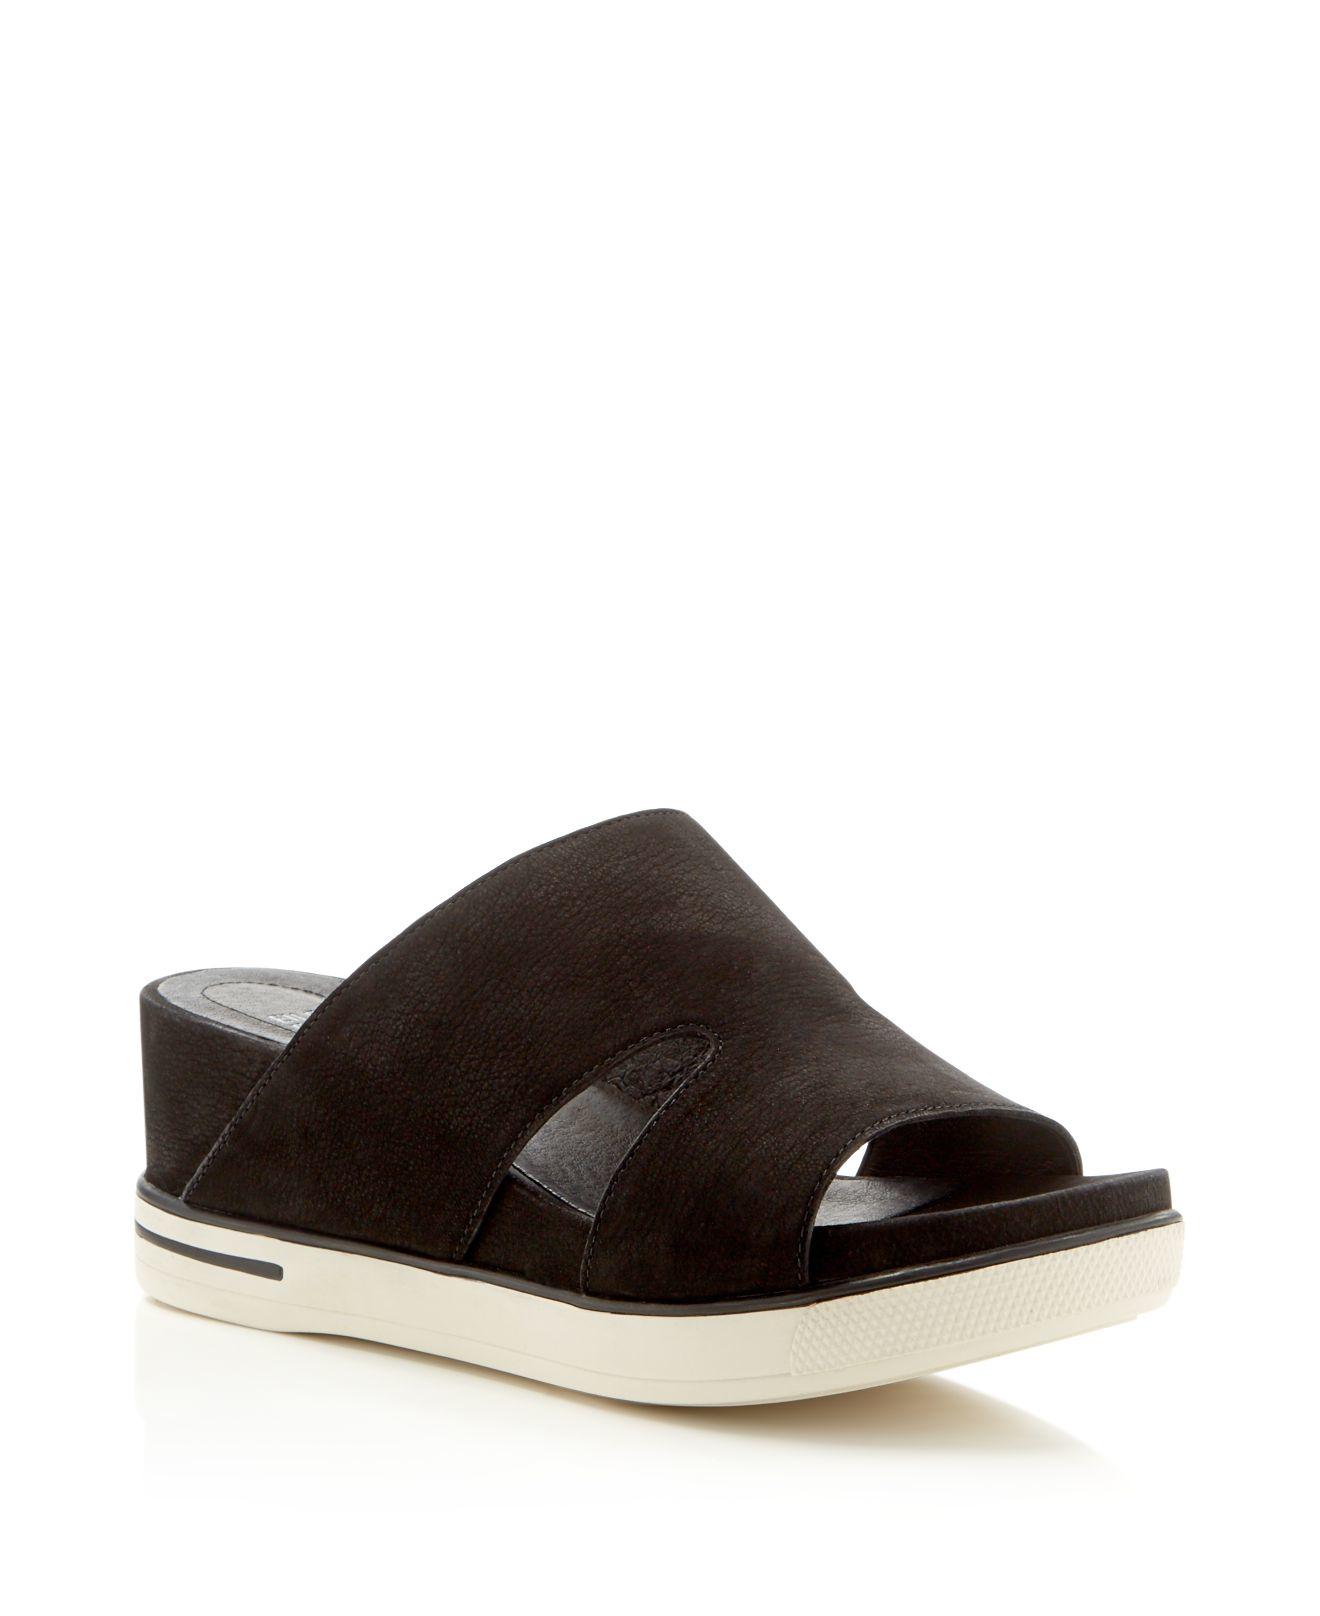 Eileen Fisher Grand Slide Flatform Sandals Bloomingdale